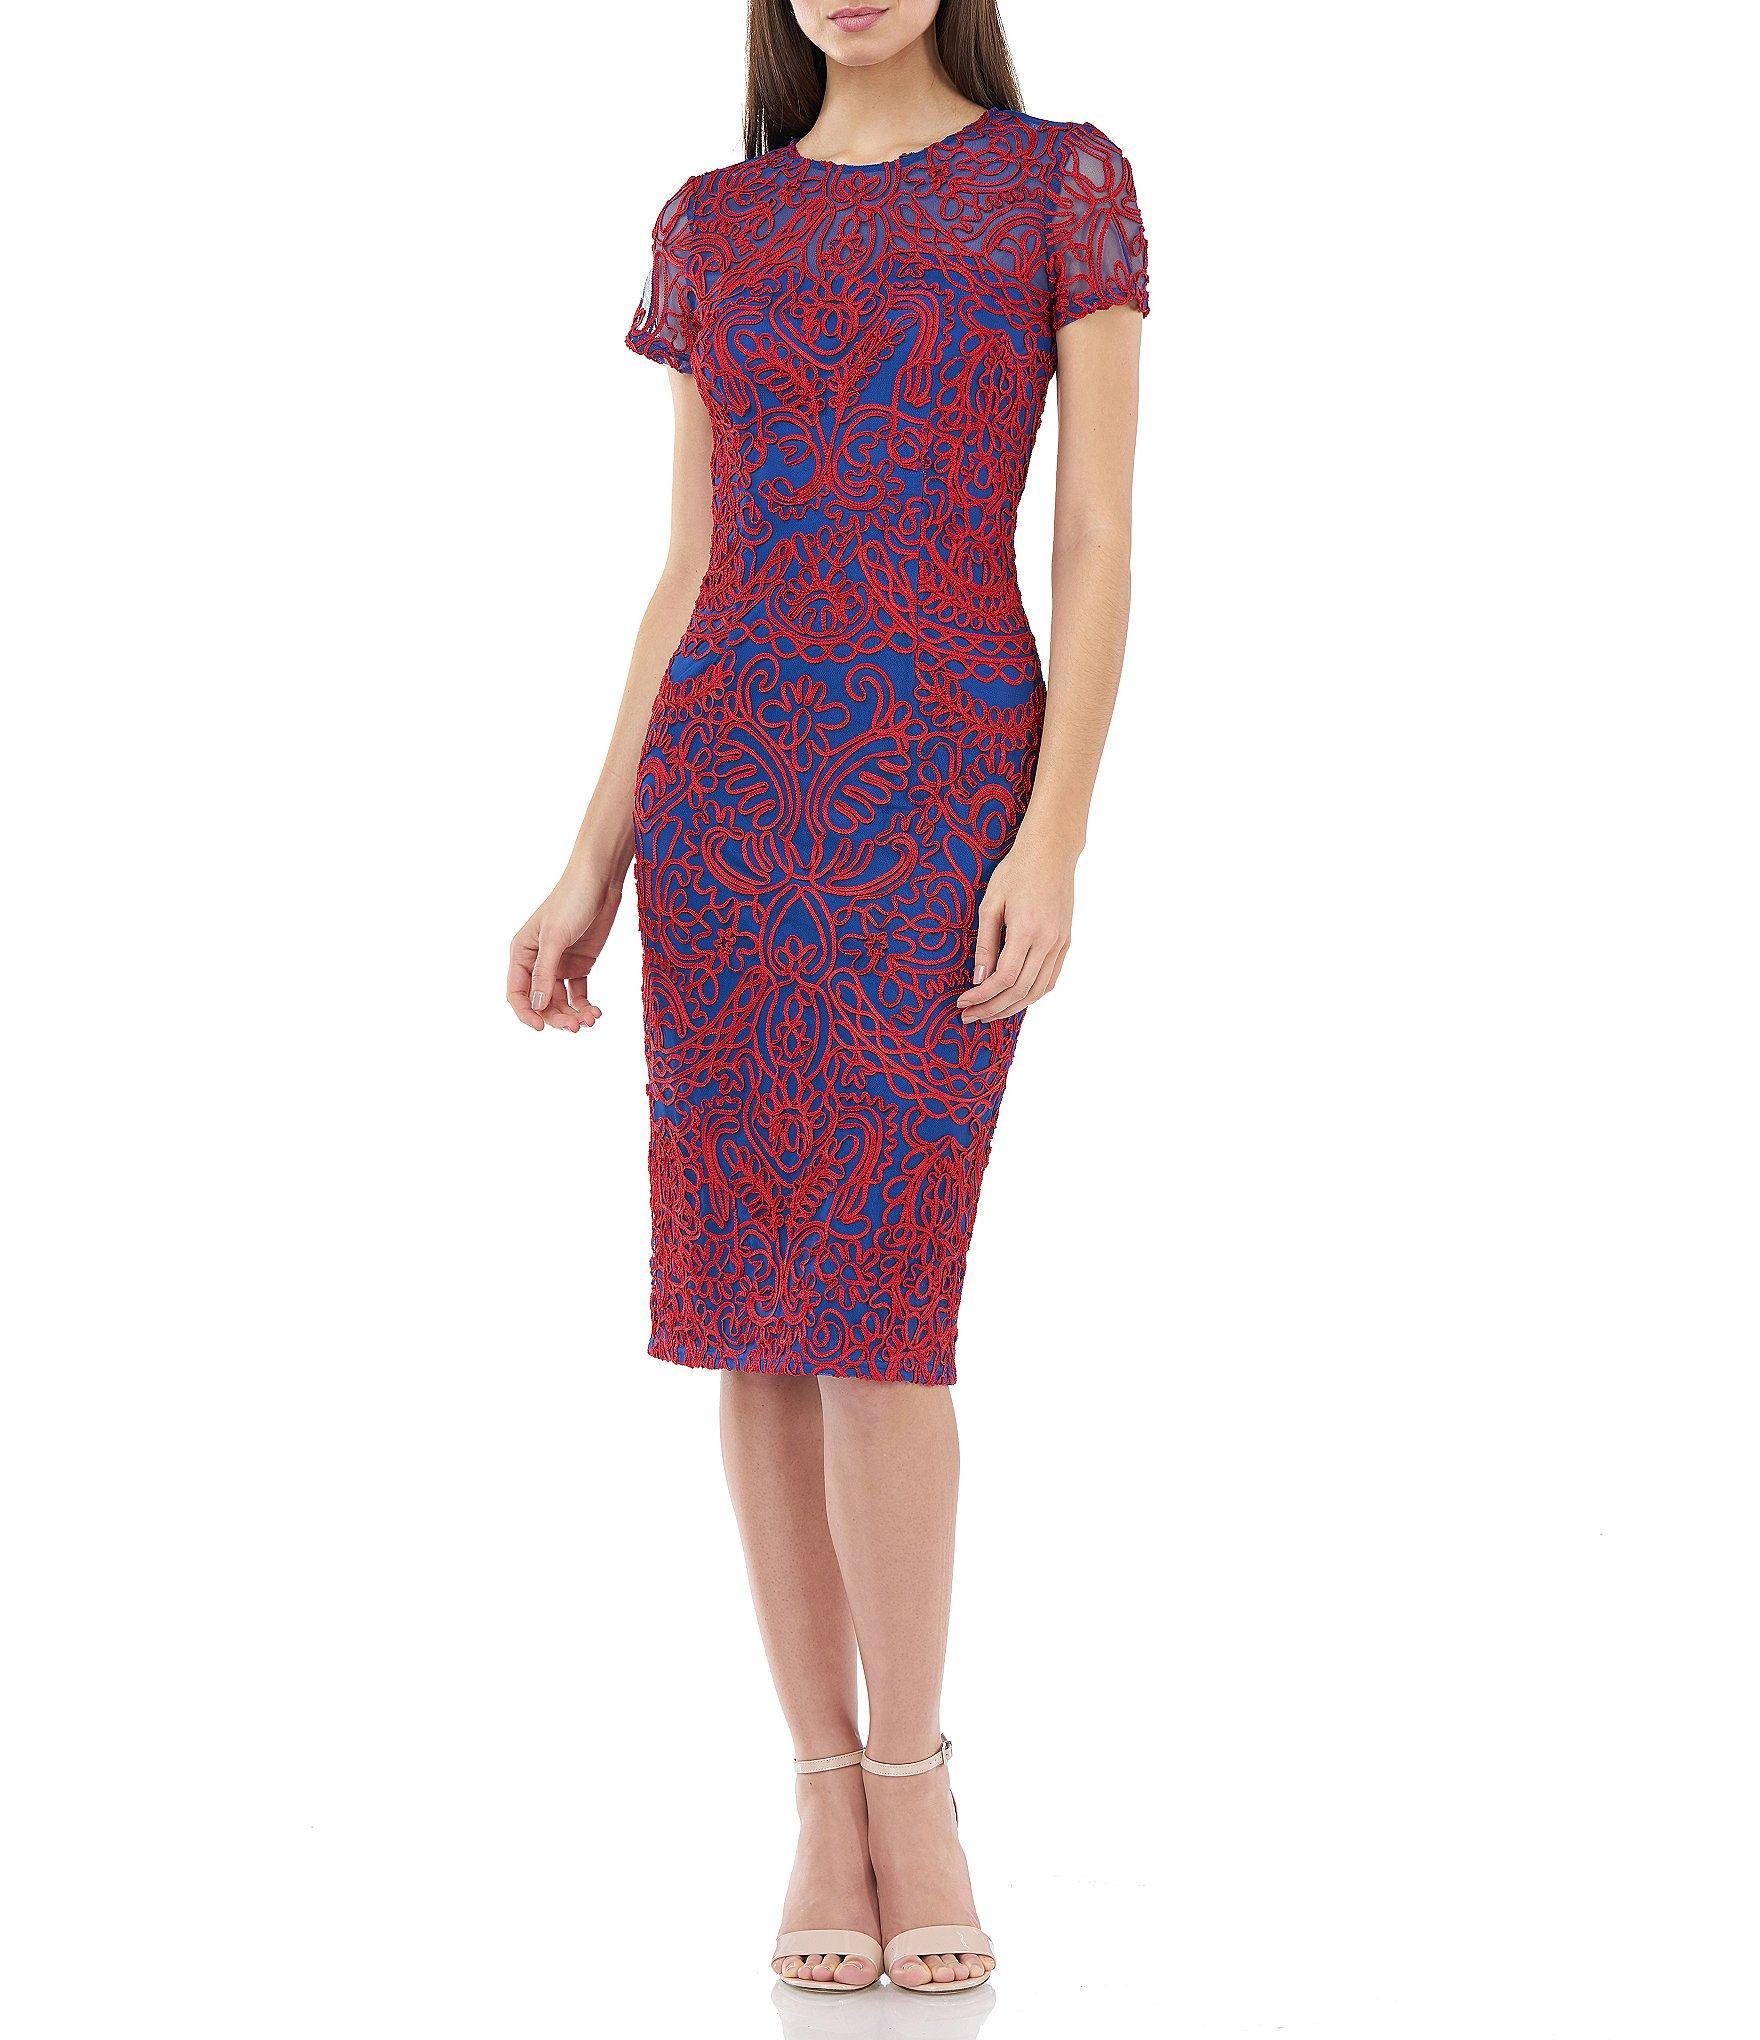 74bbfbc965 Lyst - JS Collections Soutache Midi Length Sheath Dress in Purple